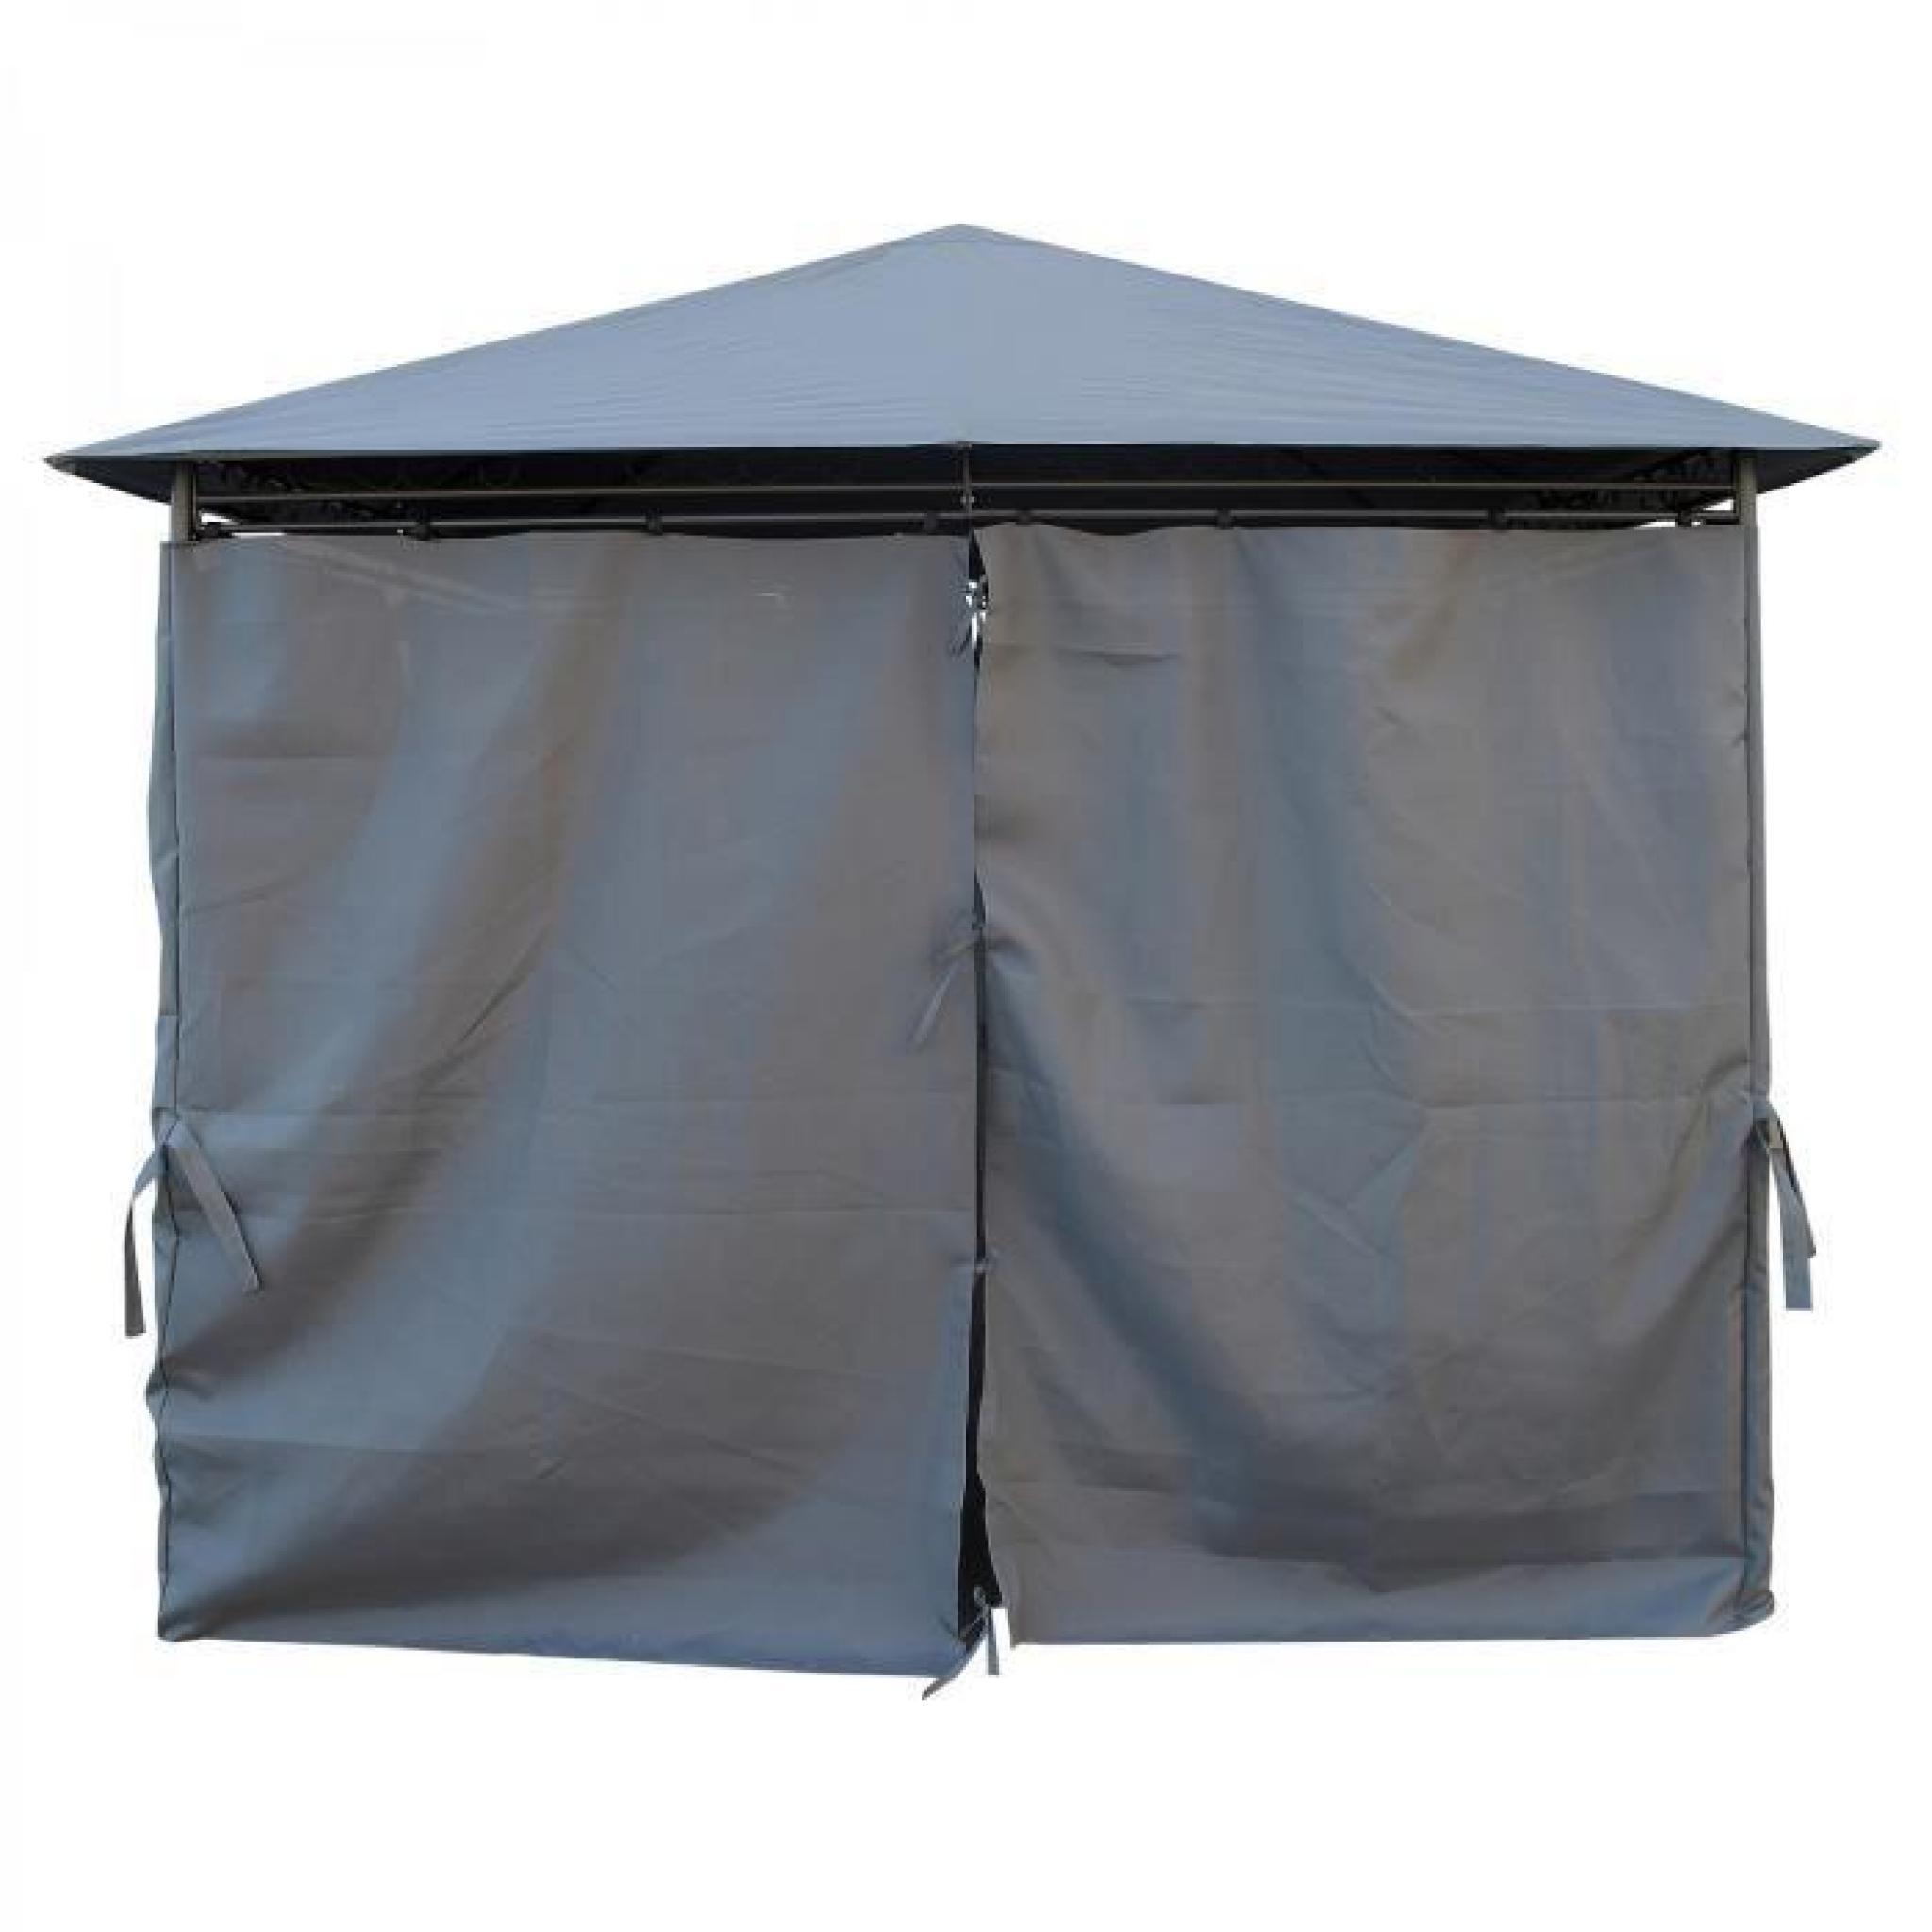 kaligagan tente de jardin pergola 3x3m gris anthracite tonnelle barnum achat vente tonnelle. Black Bedroom Furniture Sets. Home Design Ideas